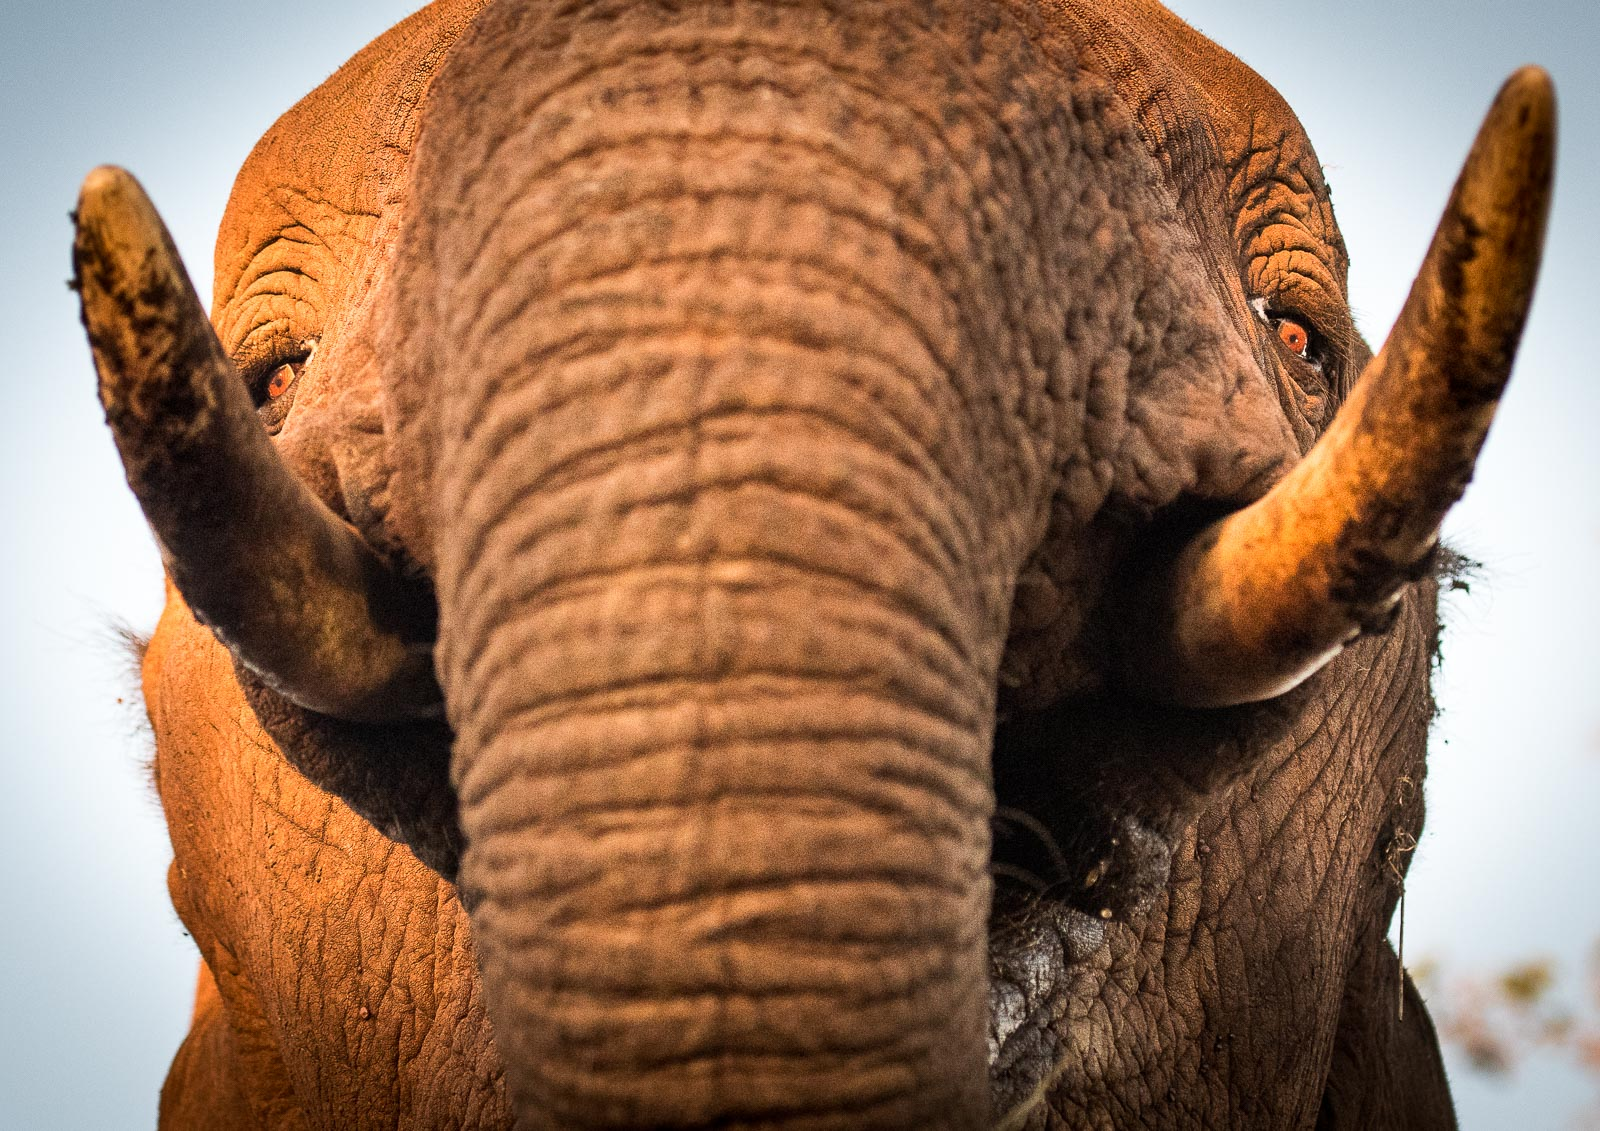 UMGODI: Elephant  Nikon D500 70-200mm f2.8 at 70mm. 1/800, f3.2, ISO2500